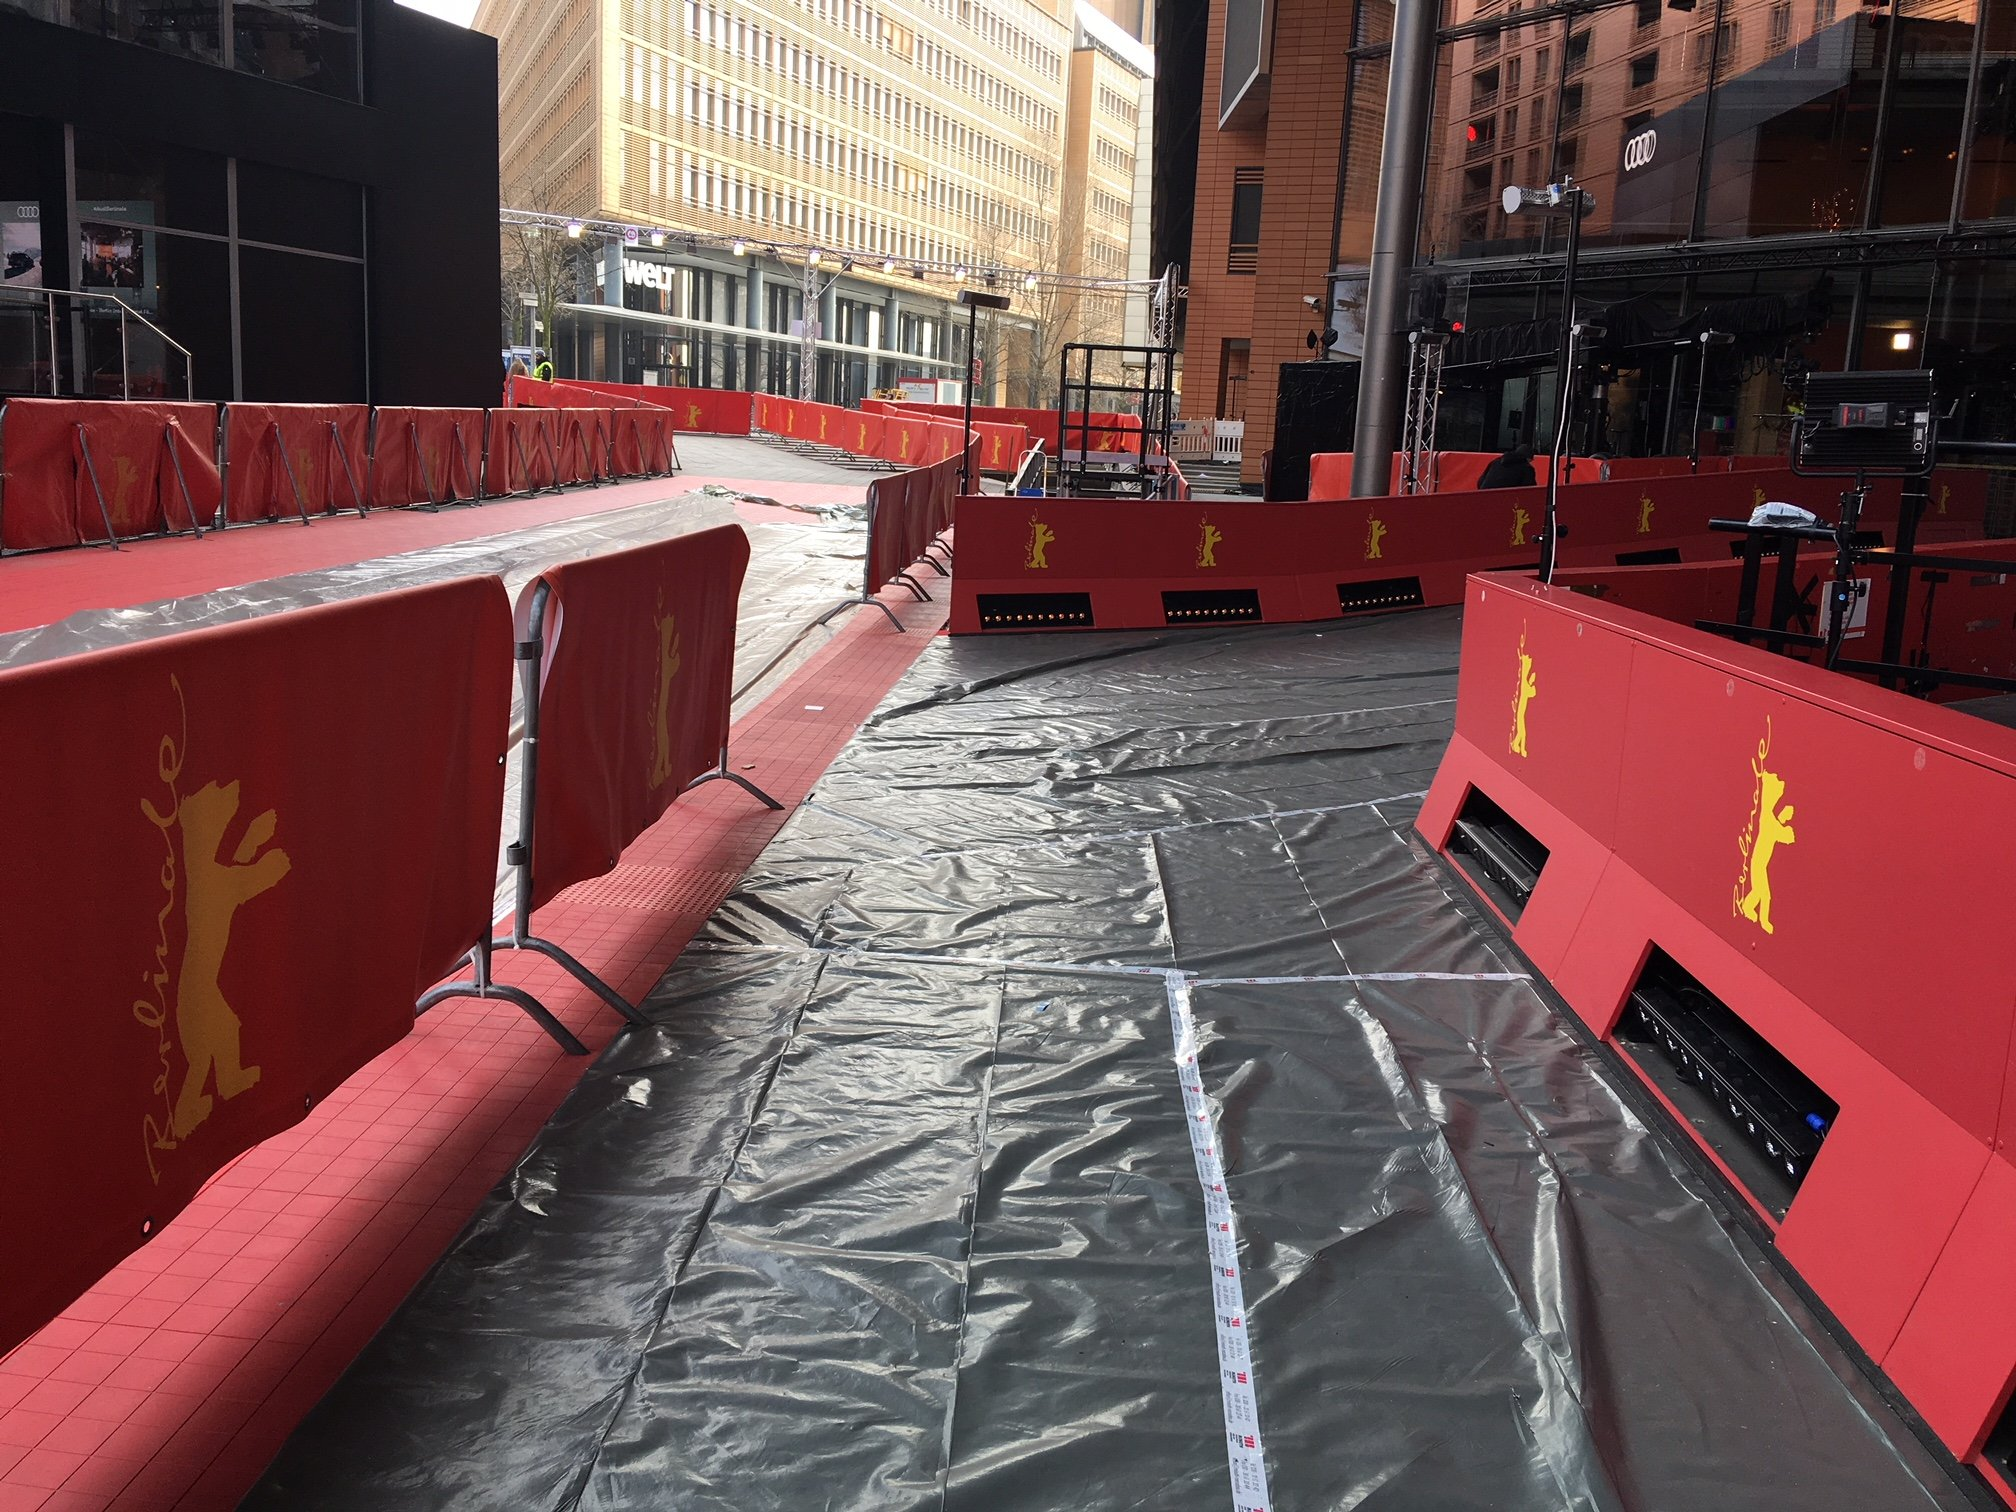 Abgedeckter Roter Teppich  (Foto: Michael Brake)